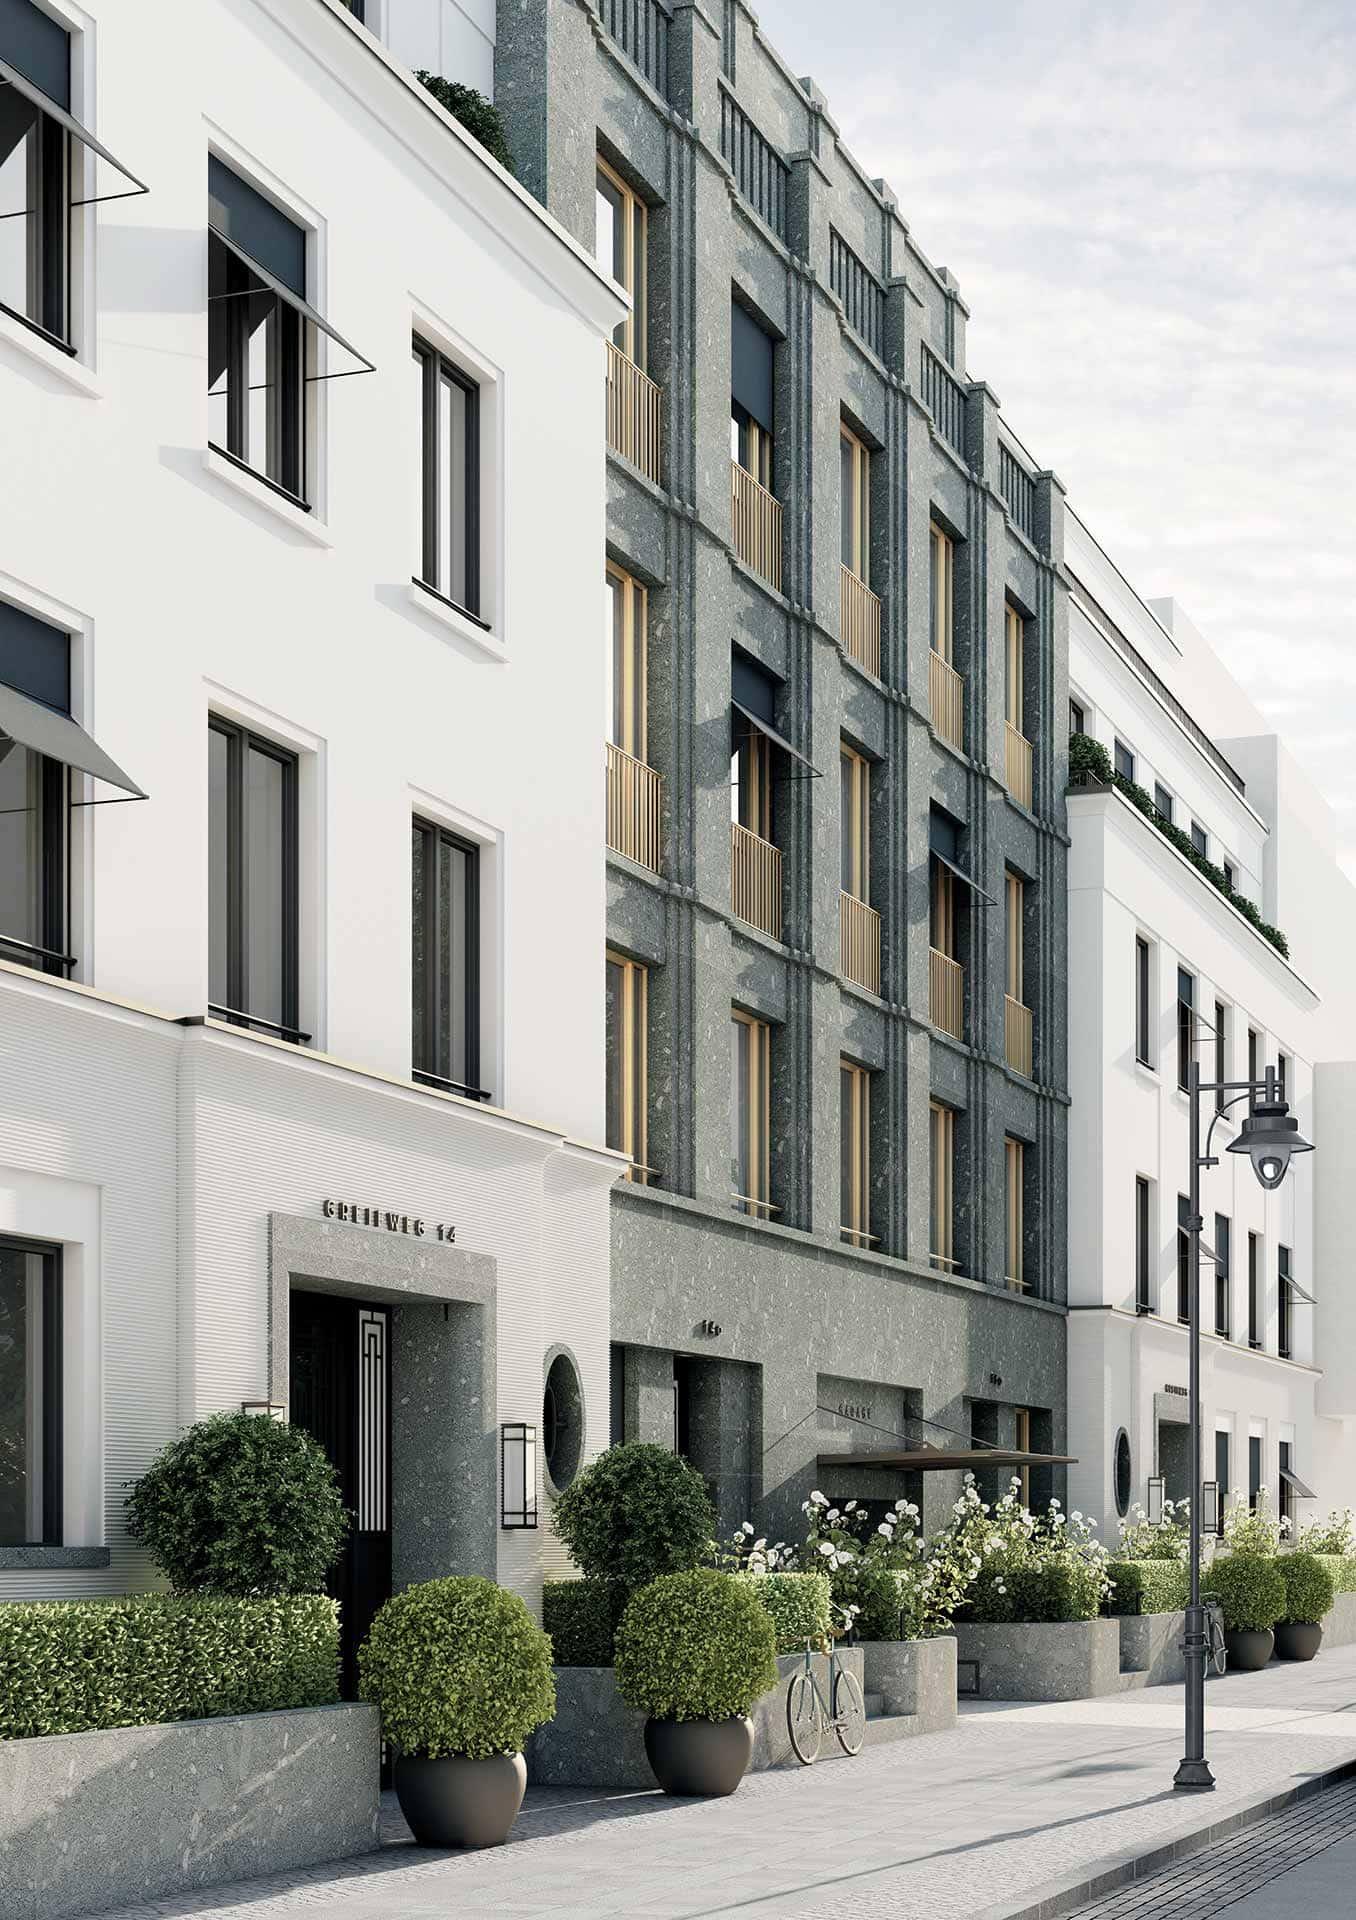 Düsseldorf-Oberkassel Greifweg Fassadenansicht